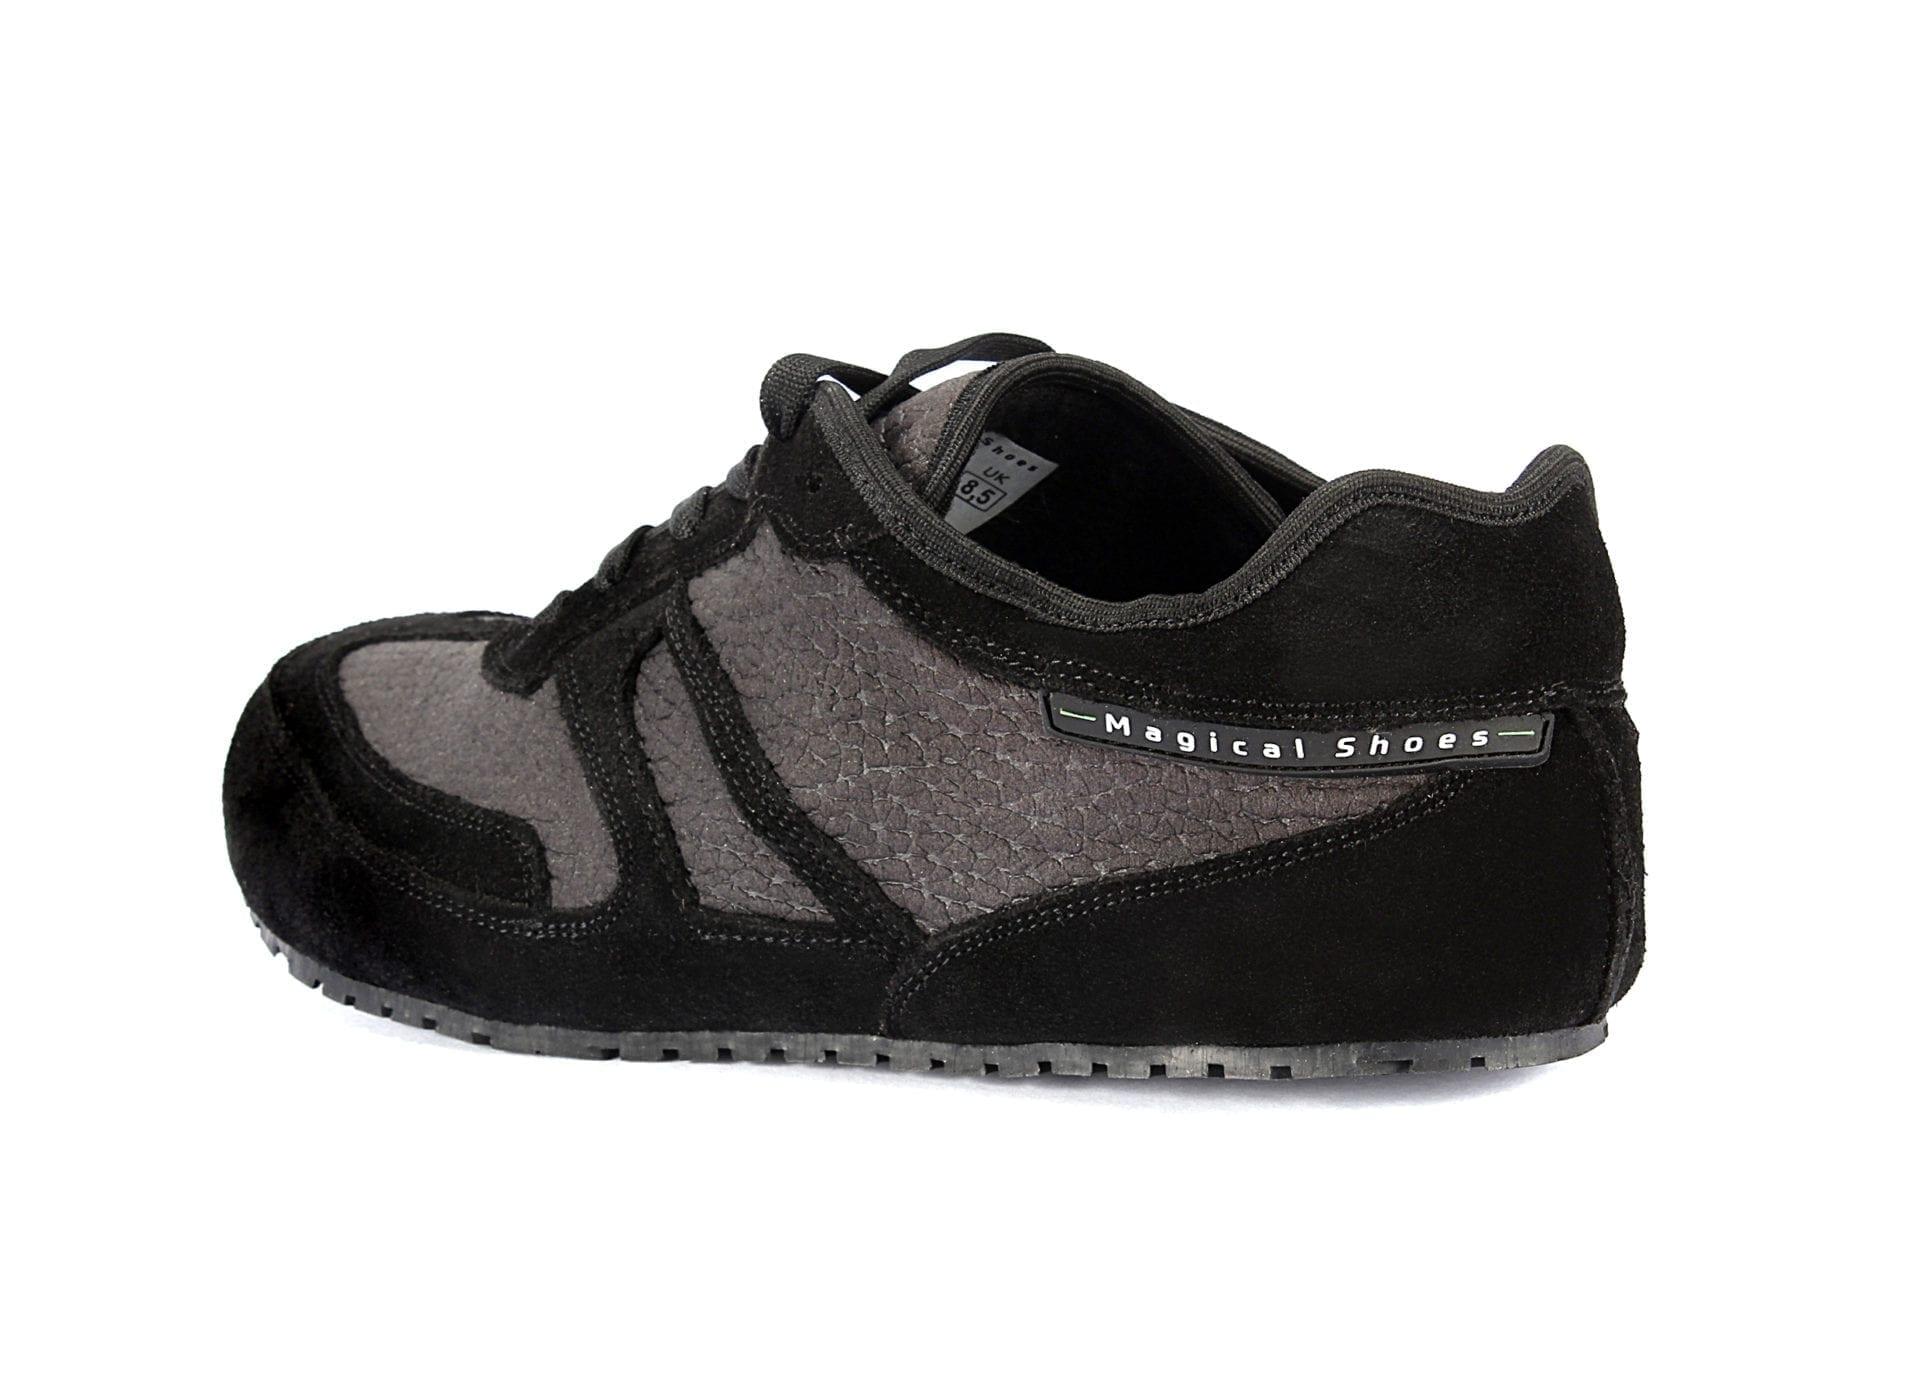 Magical Shoes BAREFOOT SHOES EXPLORER AUTUMN BARIBAL picture 2